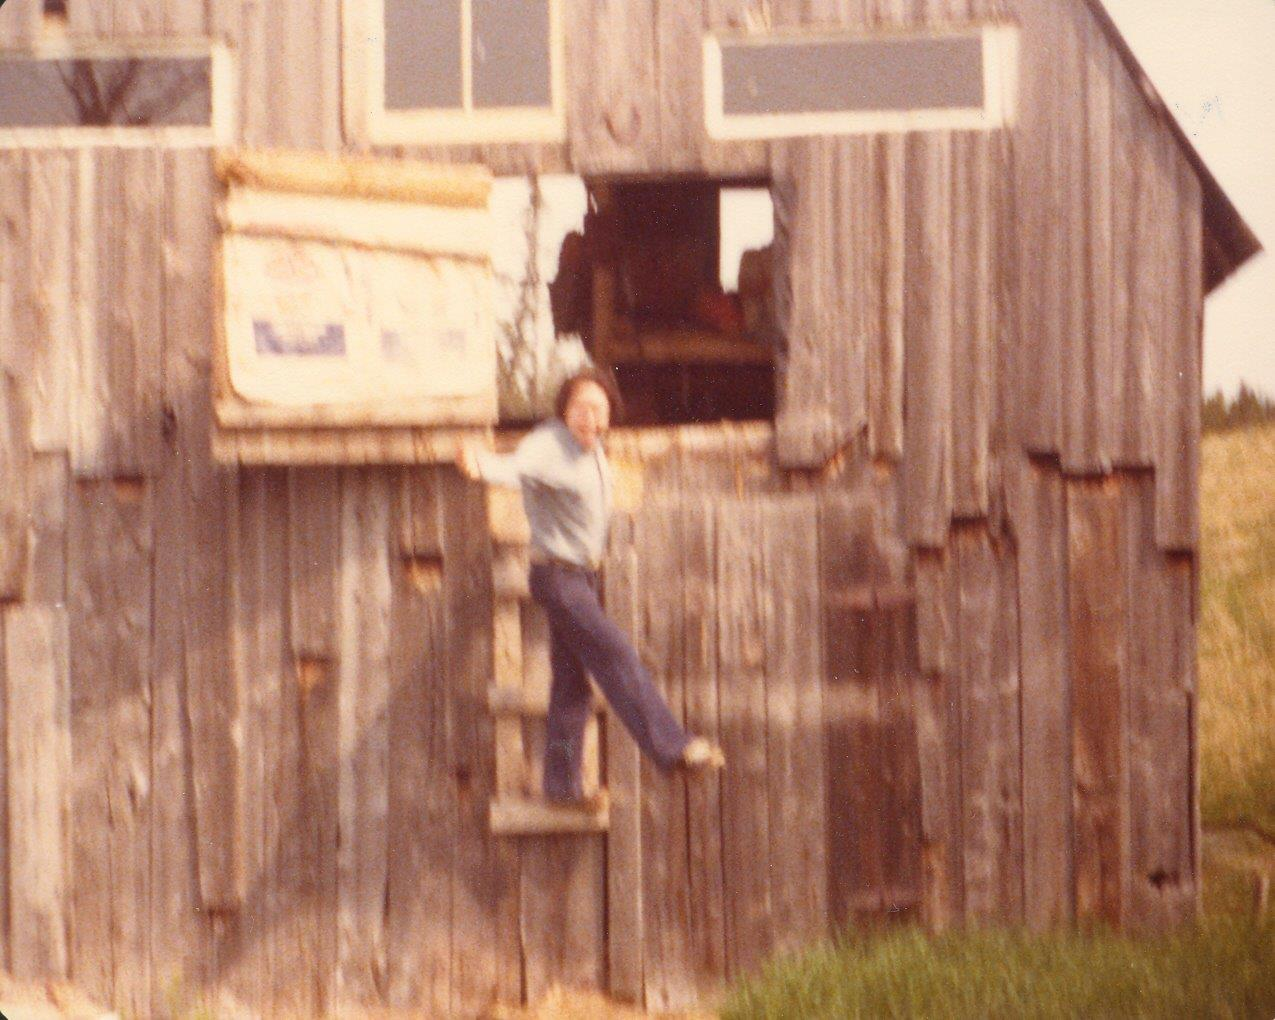 198005xx-ra-002-Wolf At Barn-Randboro